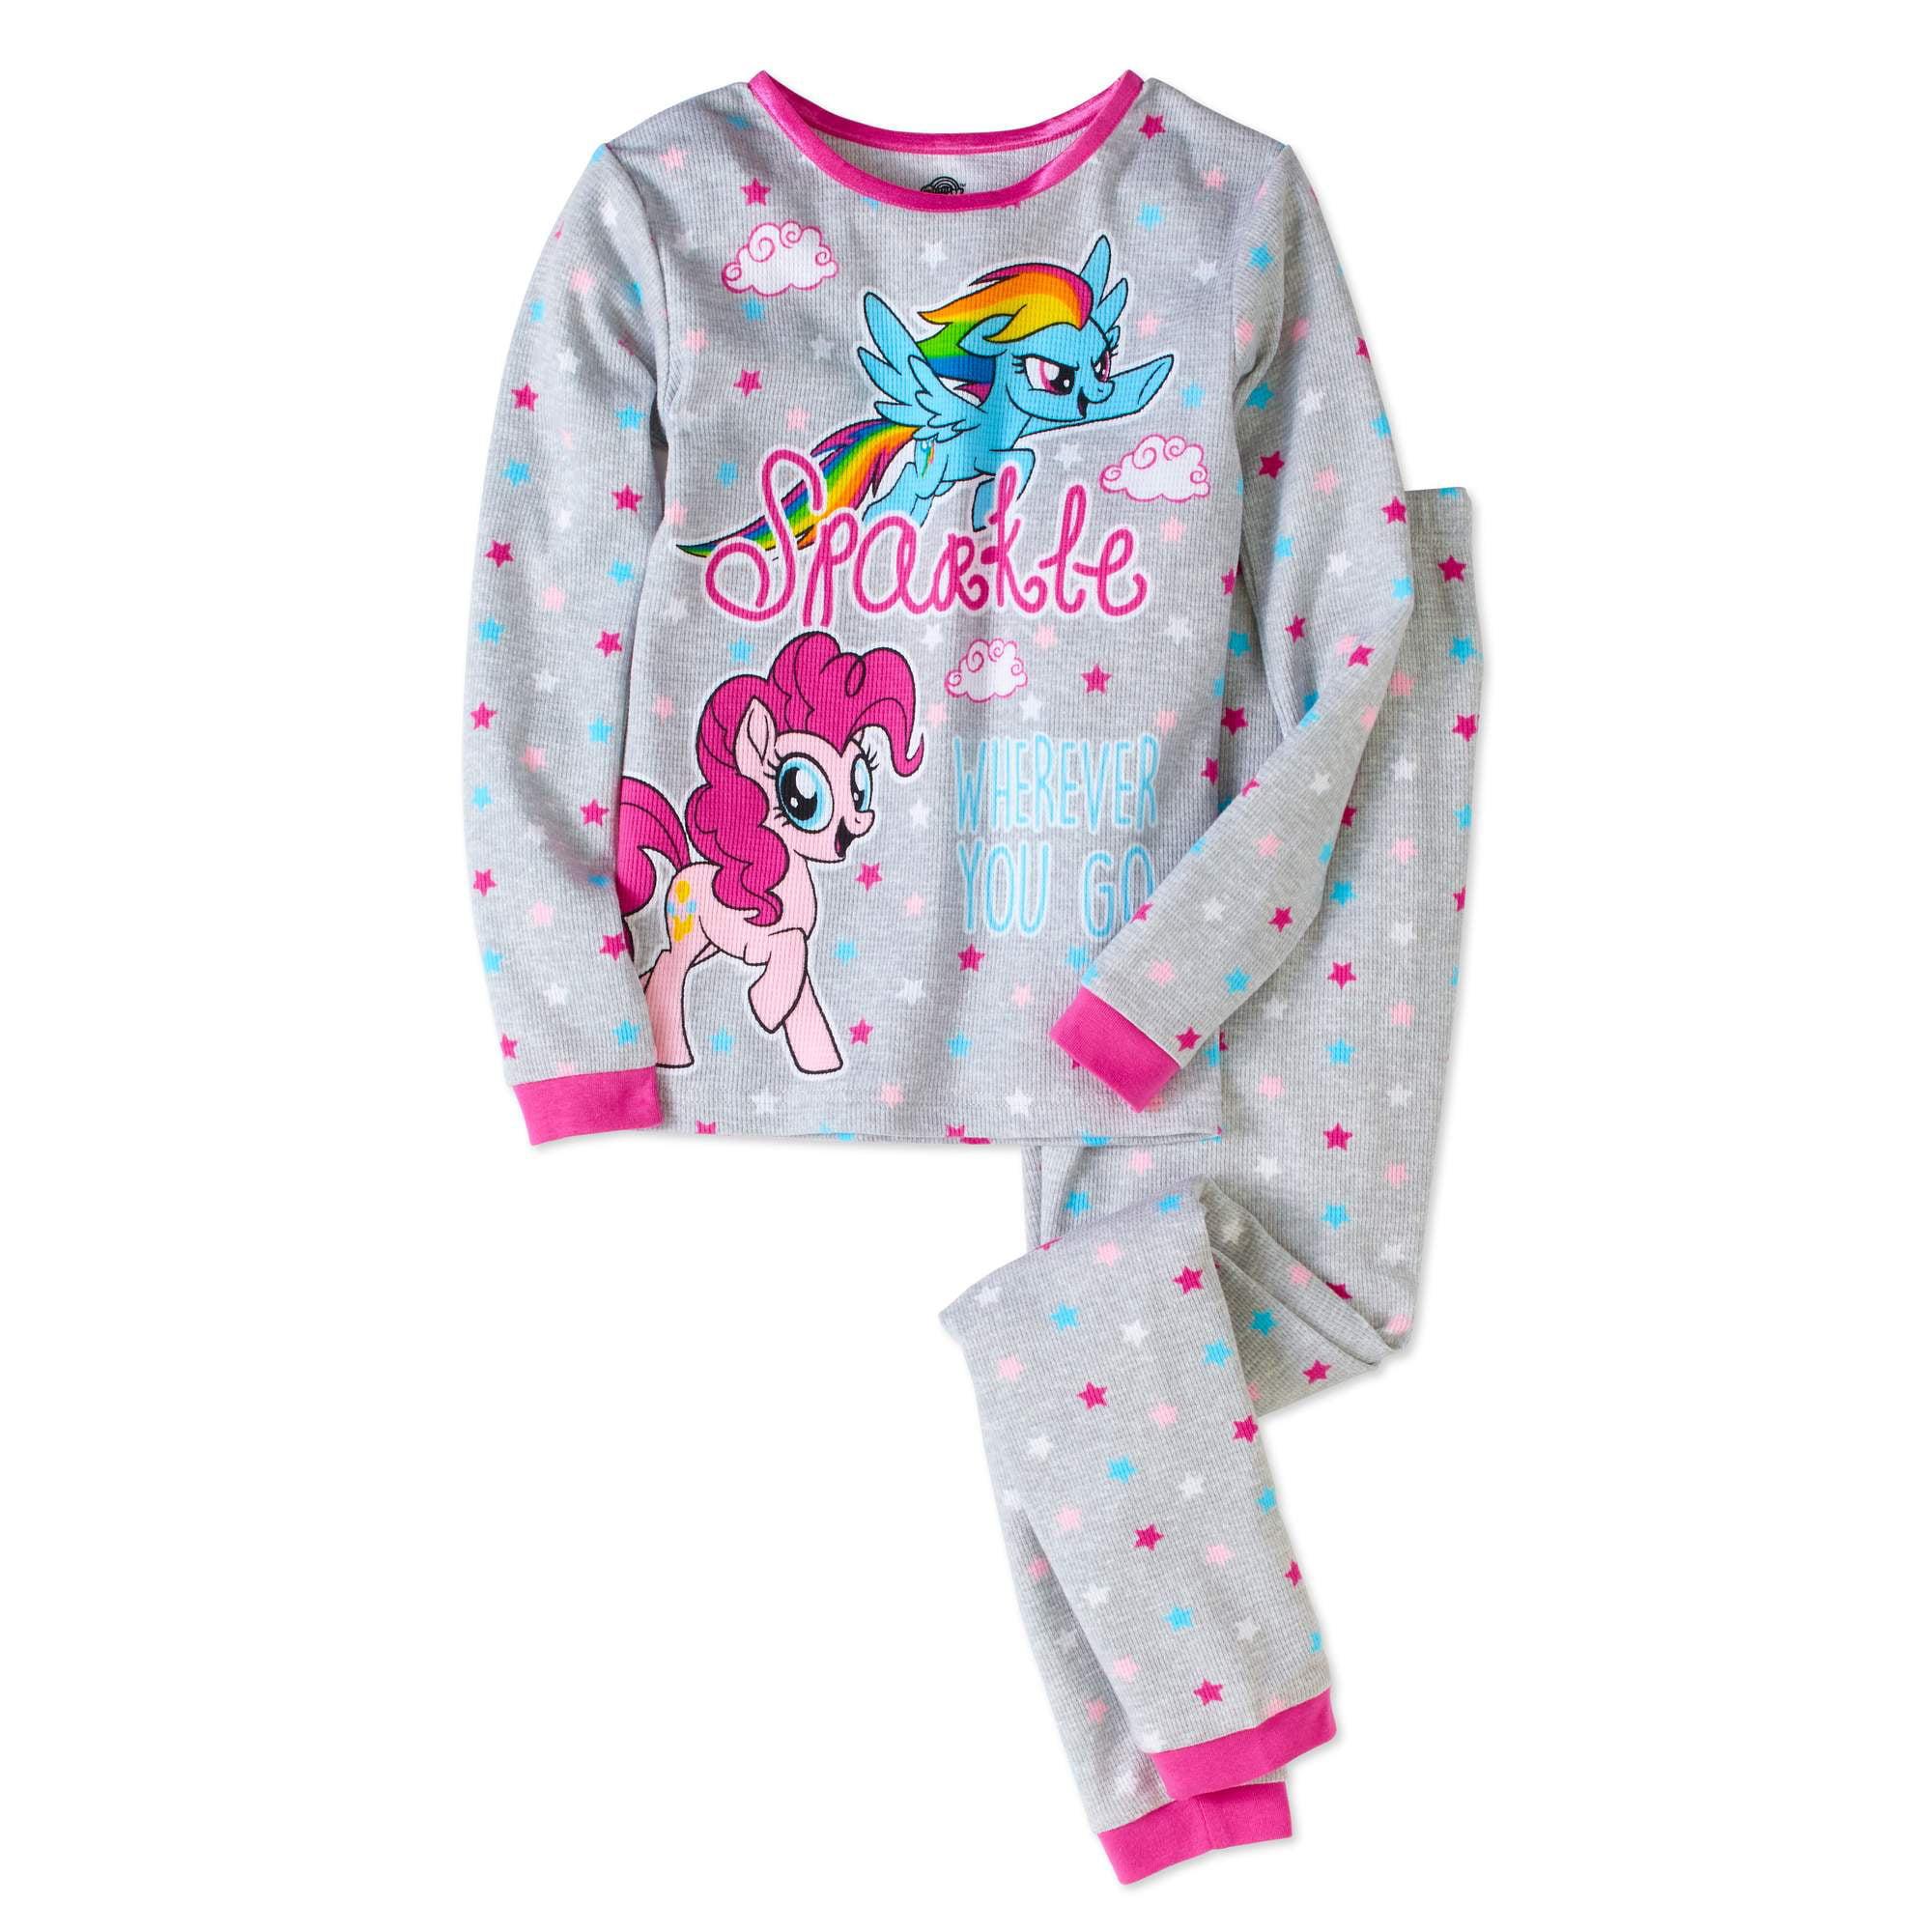 Generic My Little Pony Girls' Cotton Thermal Underwear 2pc Set